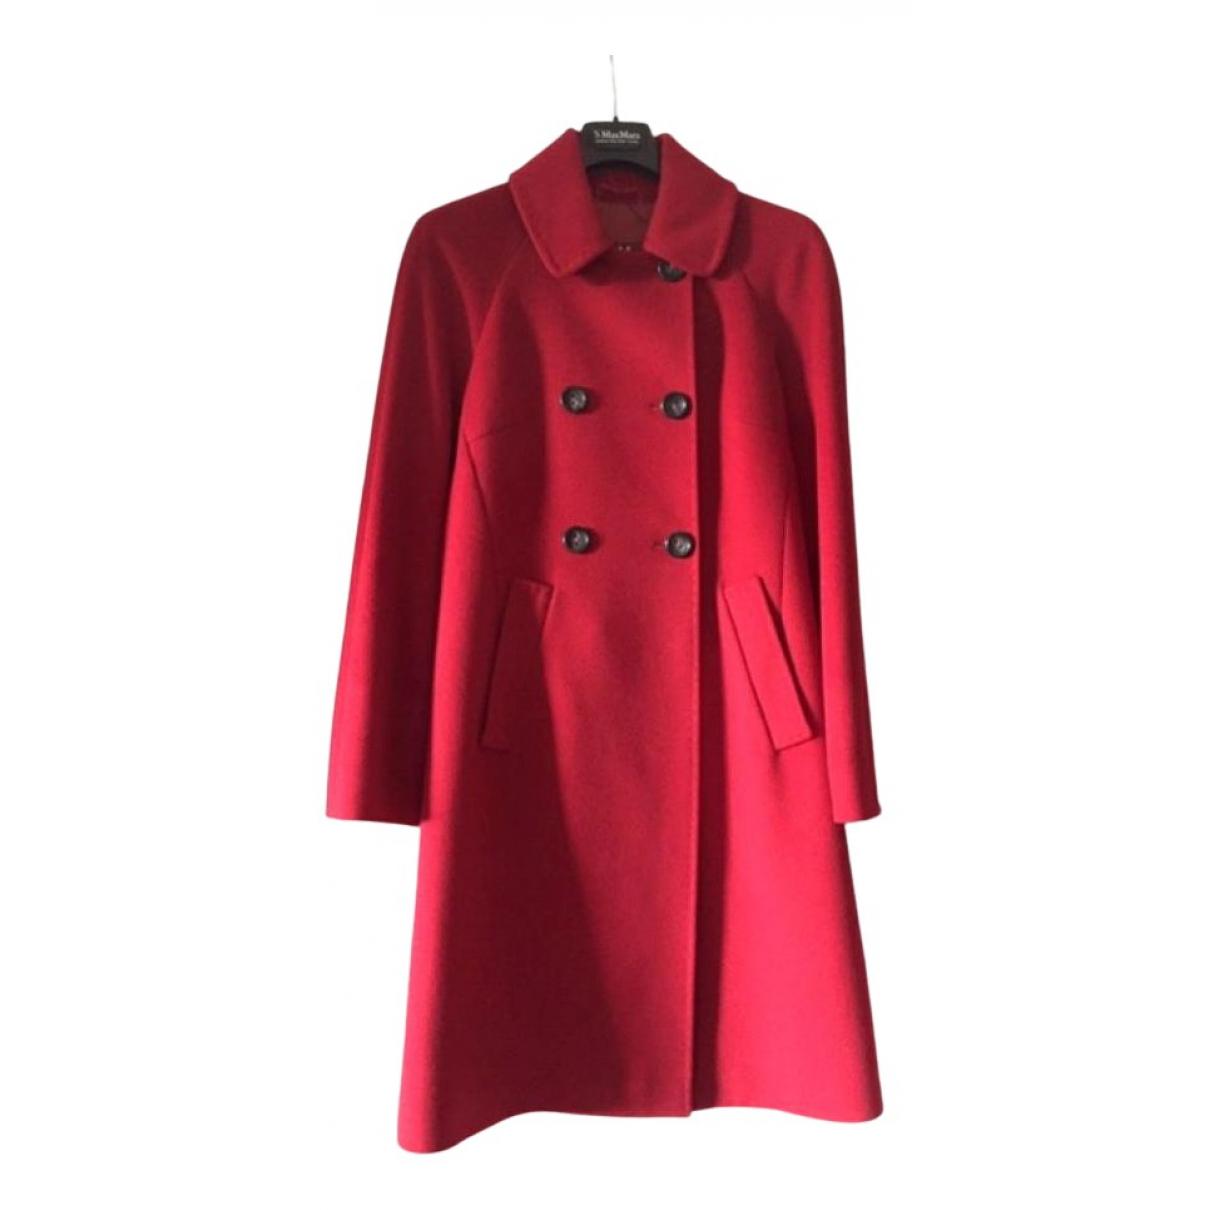 Max Mara Studio N Red Cashmere coat for Women 36 FR